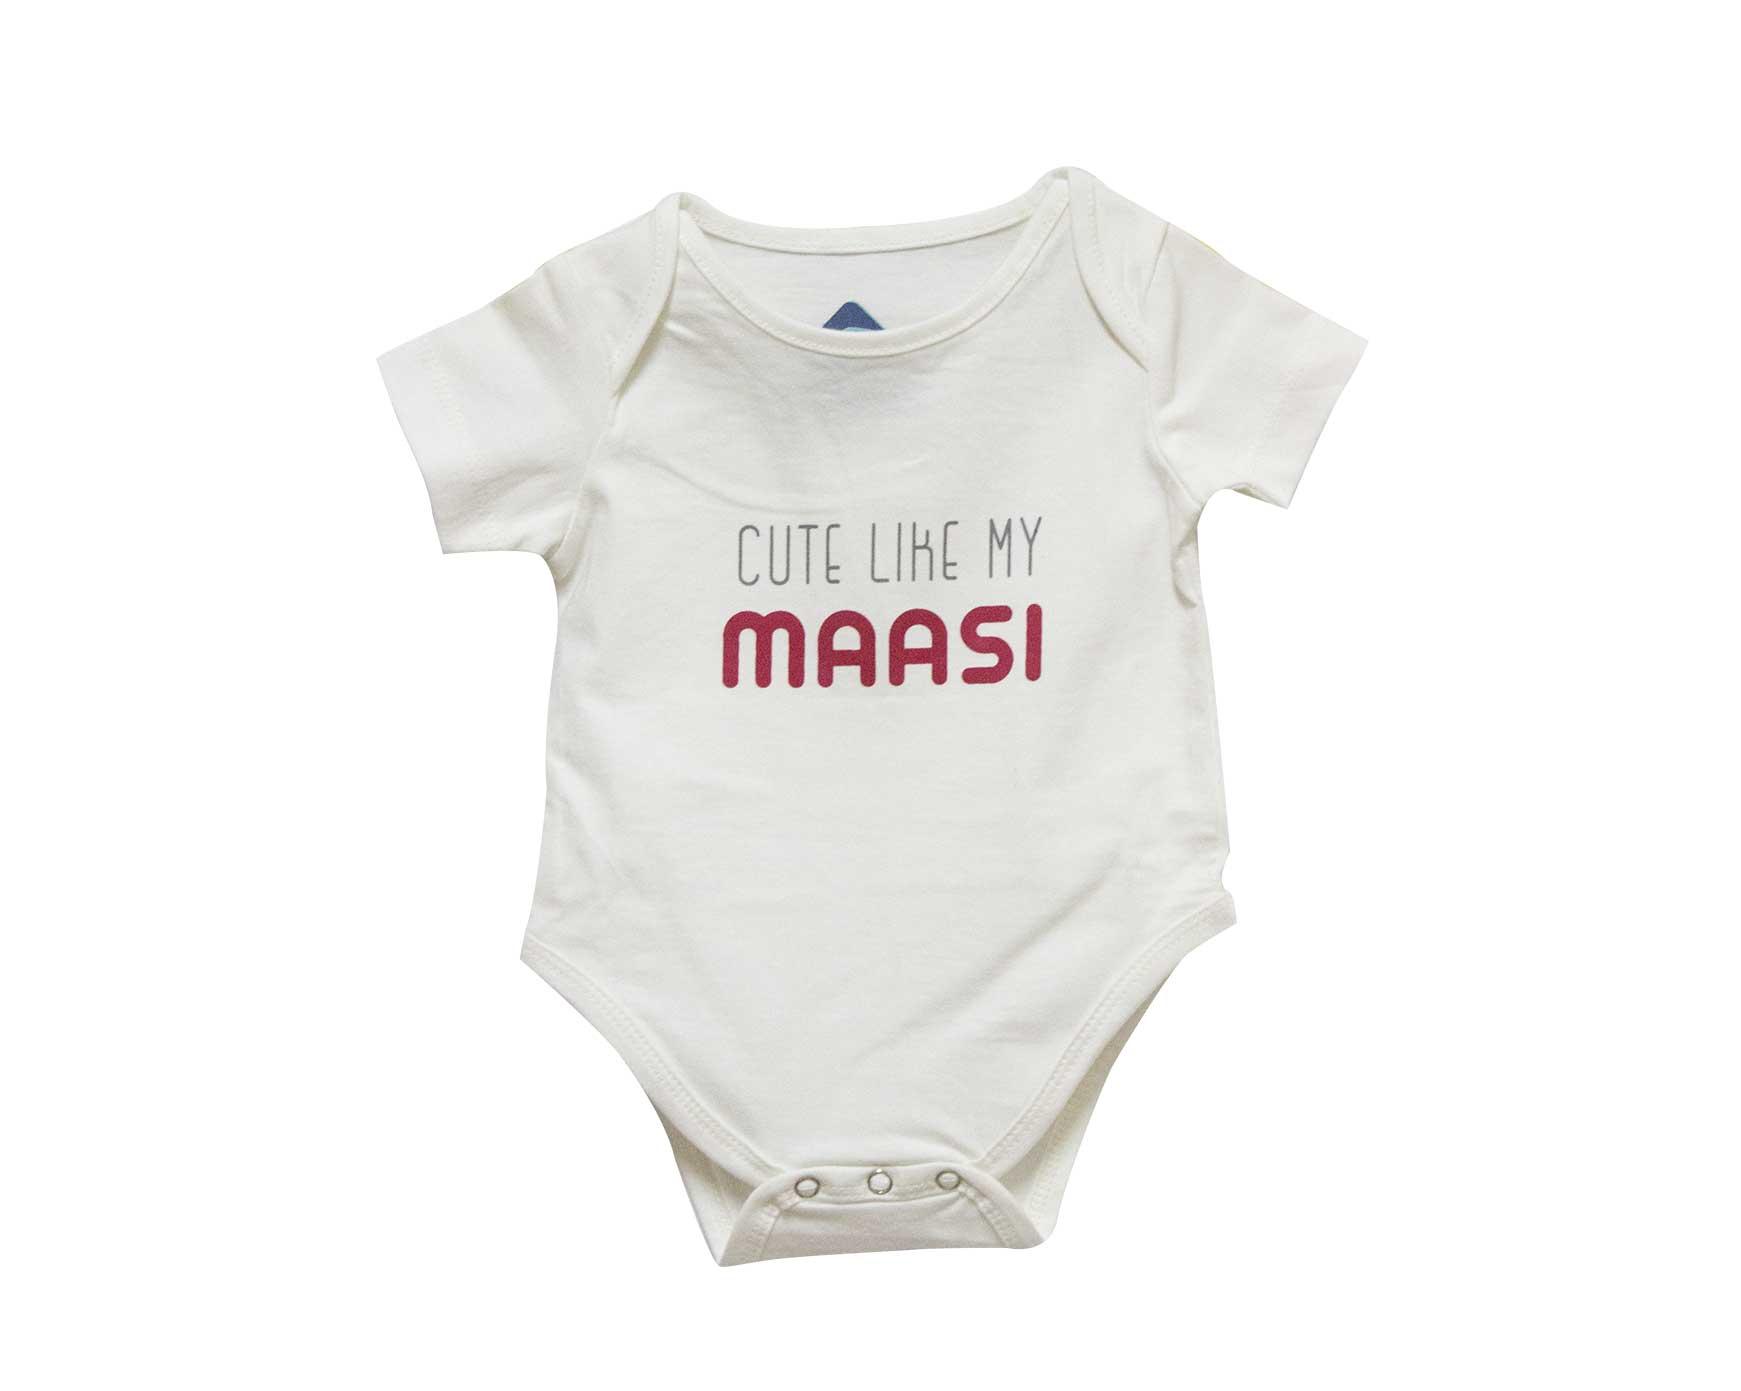 Cute-Like-Maasi.jpg